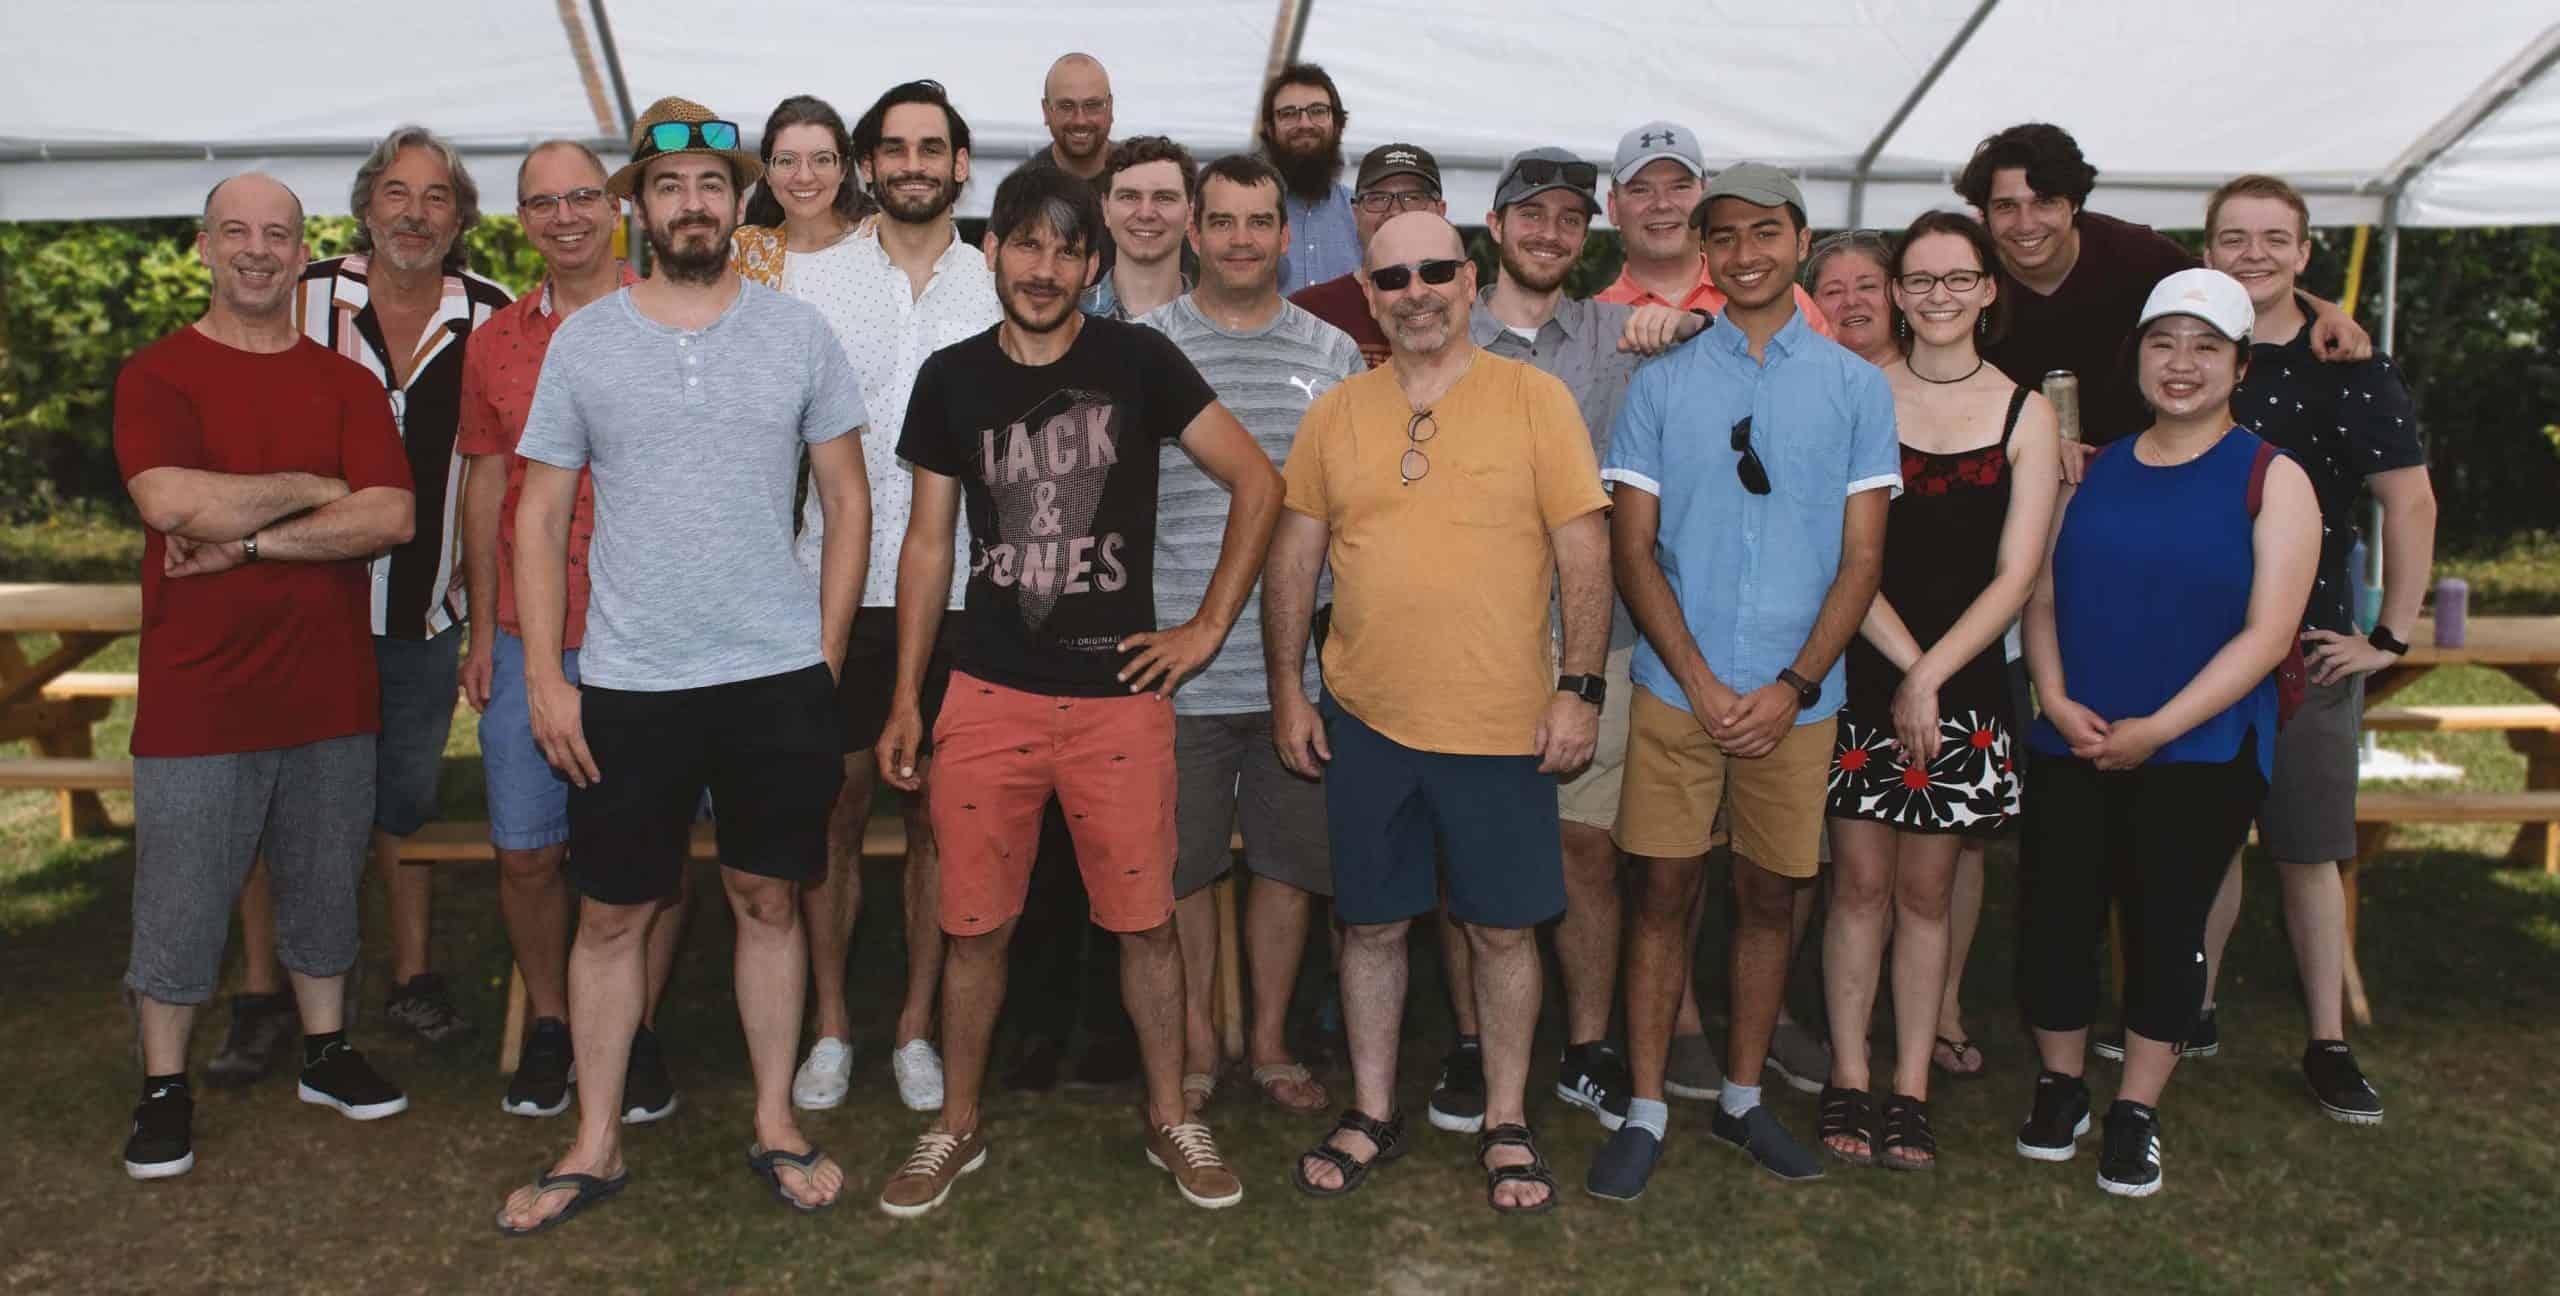 Photo équipe Vokeso Team - Août 2021 August - Partenaire Microsoft Dynamics 365 Partner